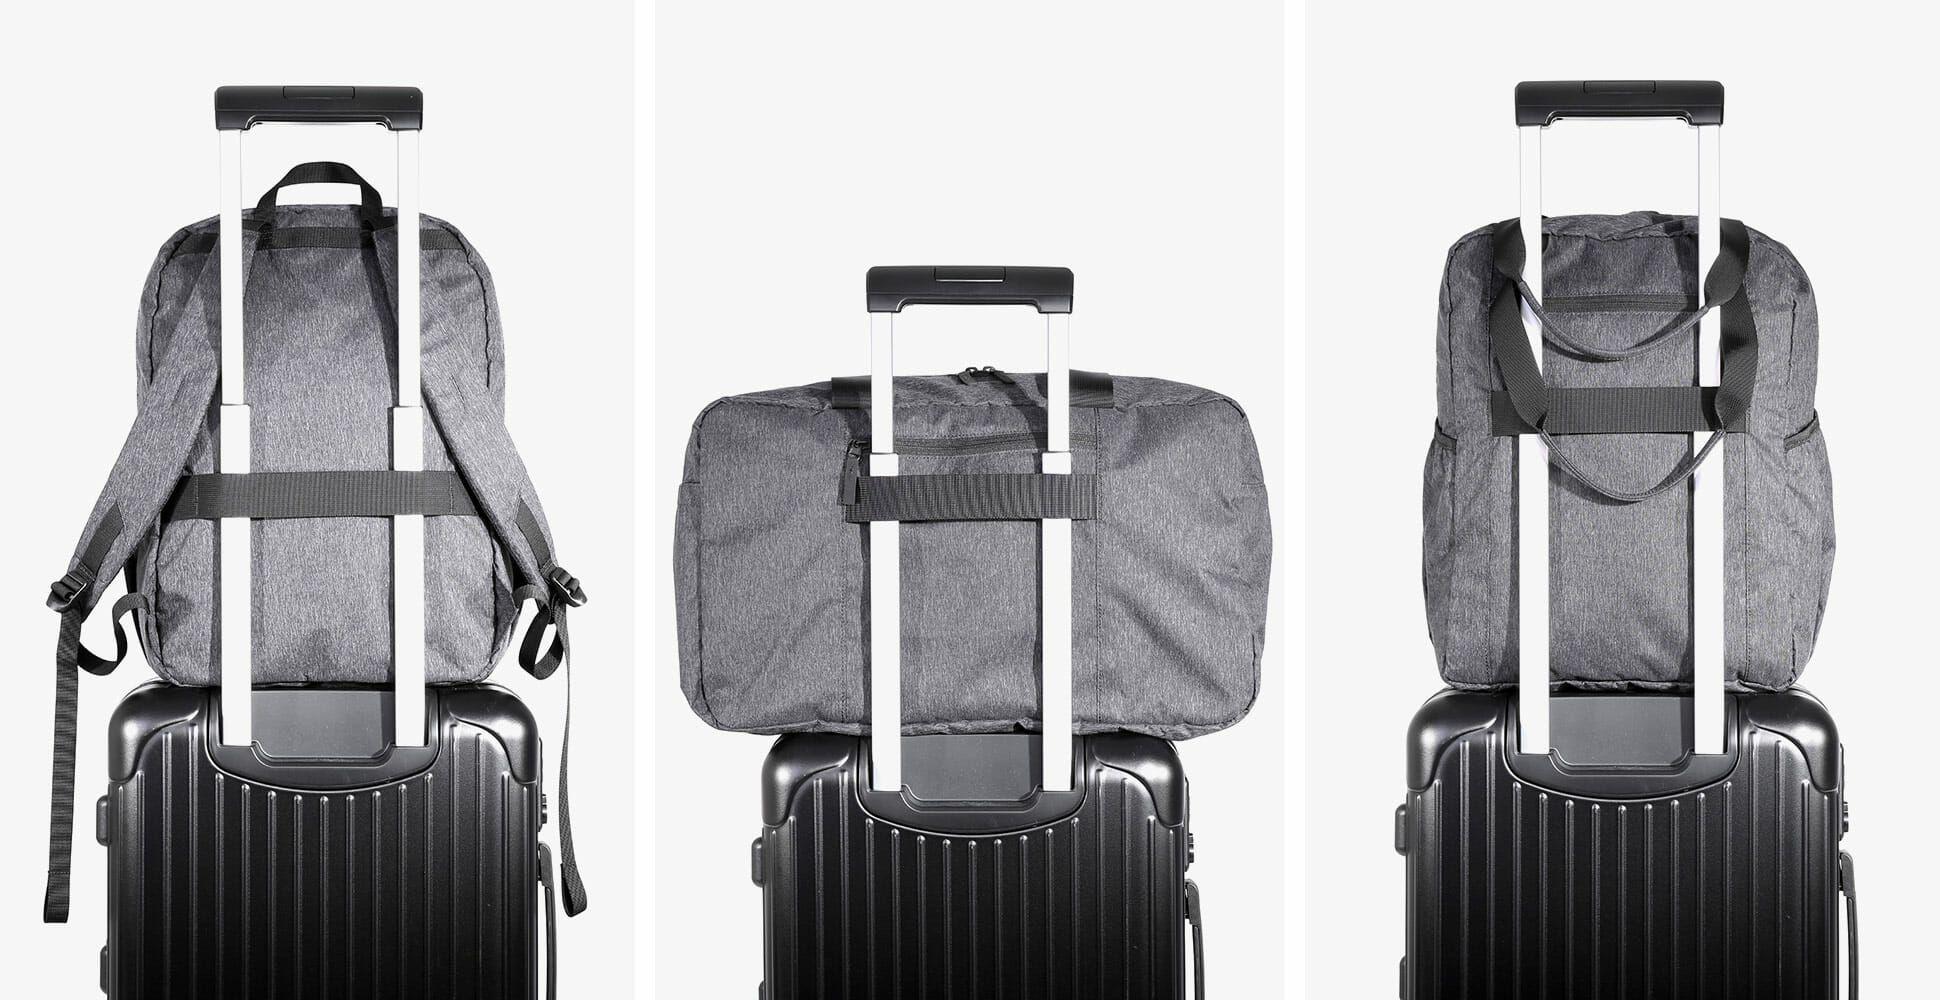 Aer Go Bags Luggage